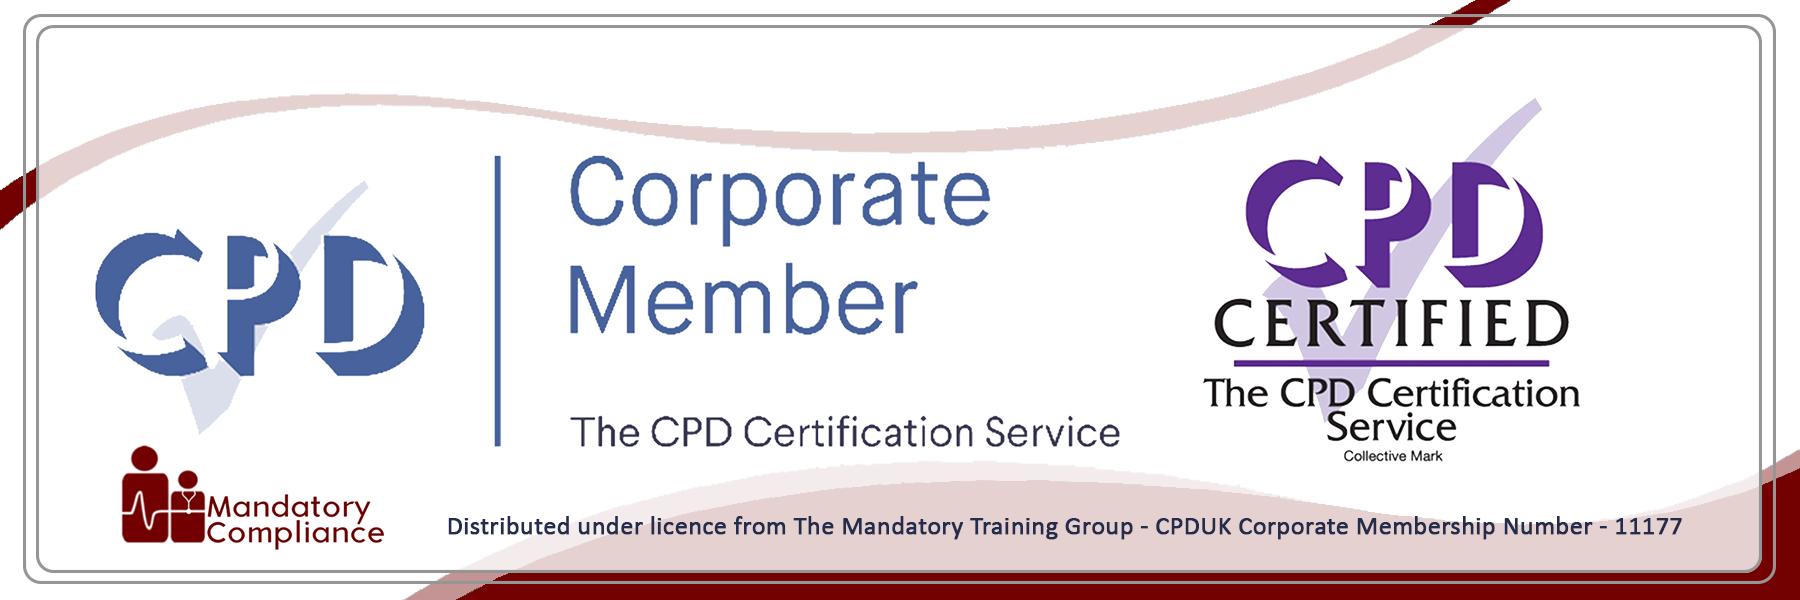 Critical Thinking - Online Training Course - CPDUK Accredited - Mandatory Compliance UK -